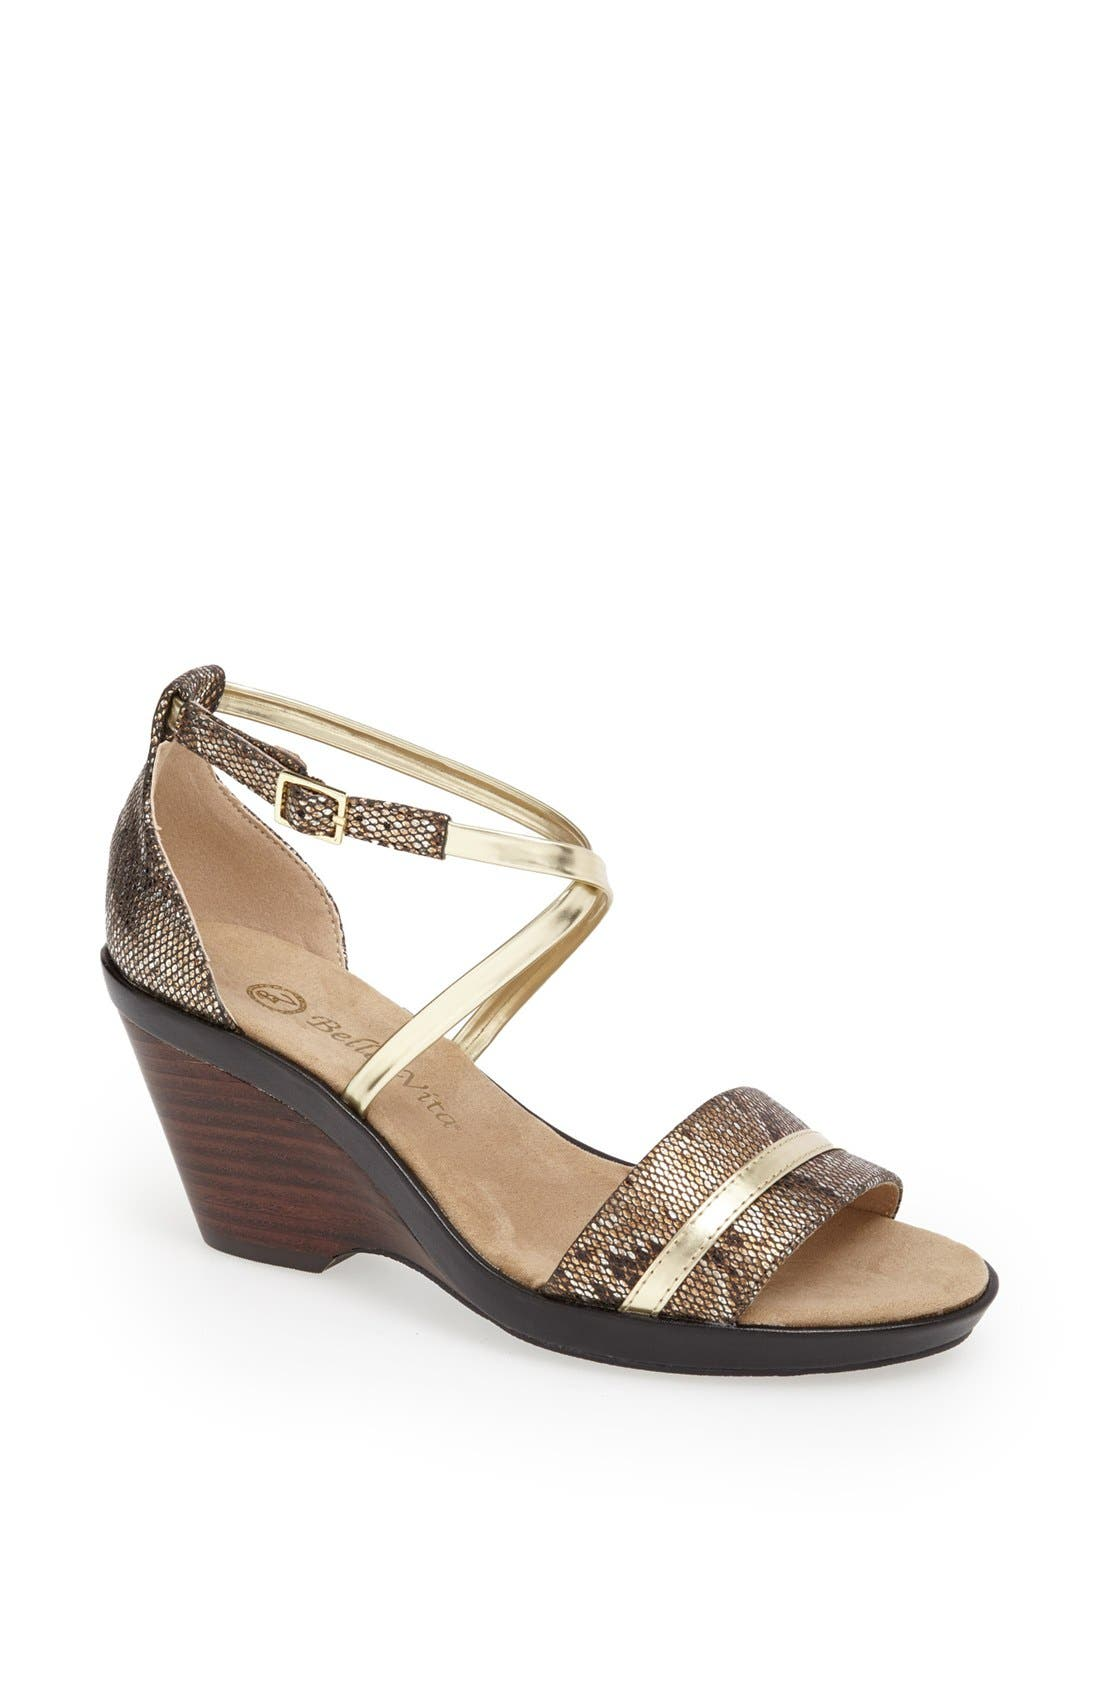 Main Image - Bella Vita 'Jozie II' Sandal